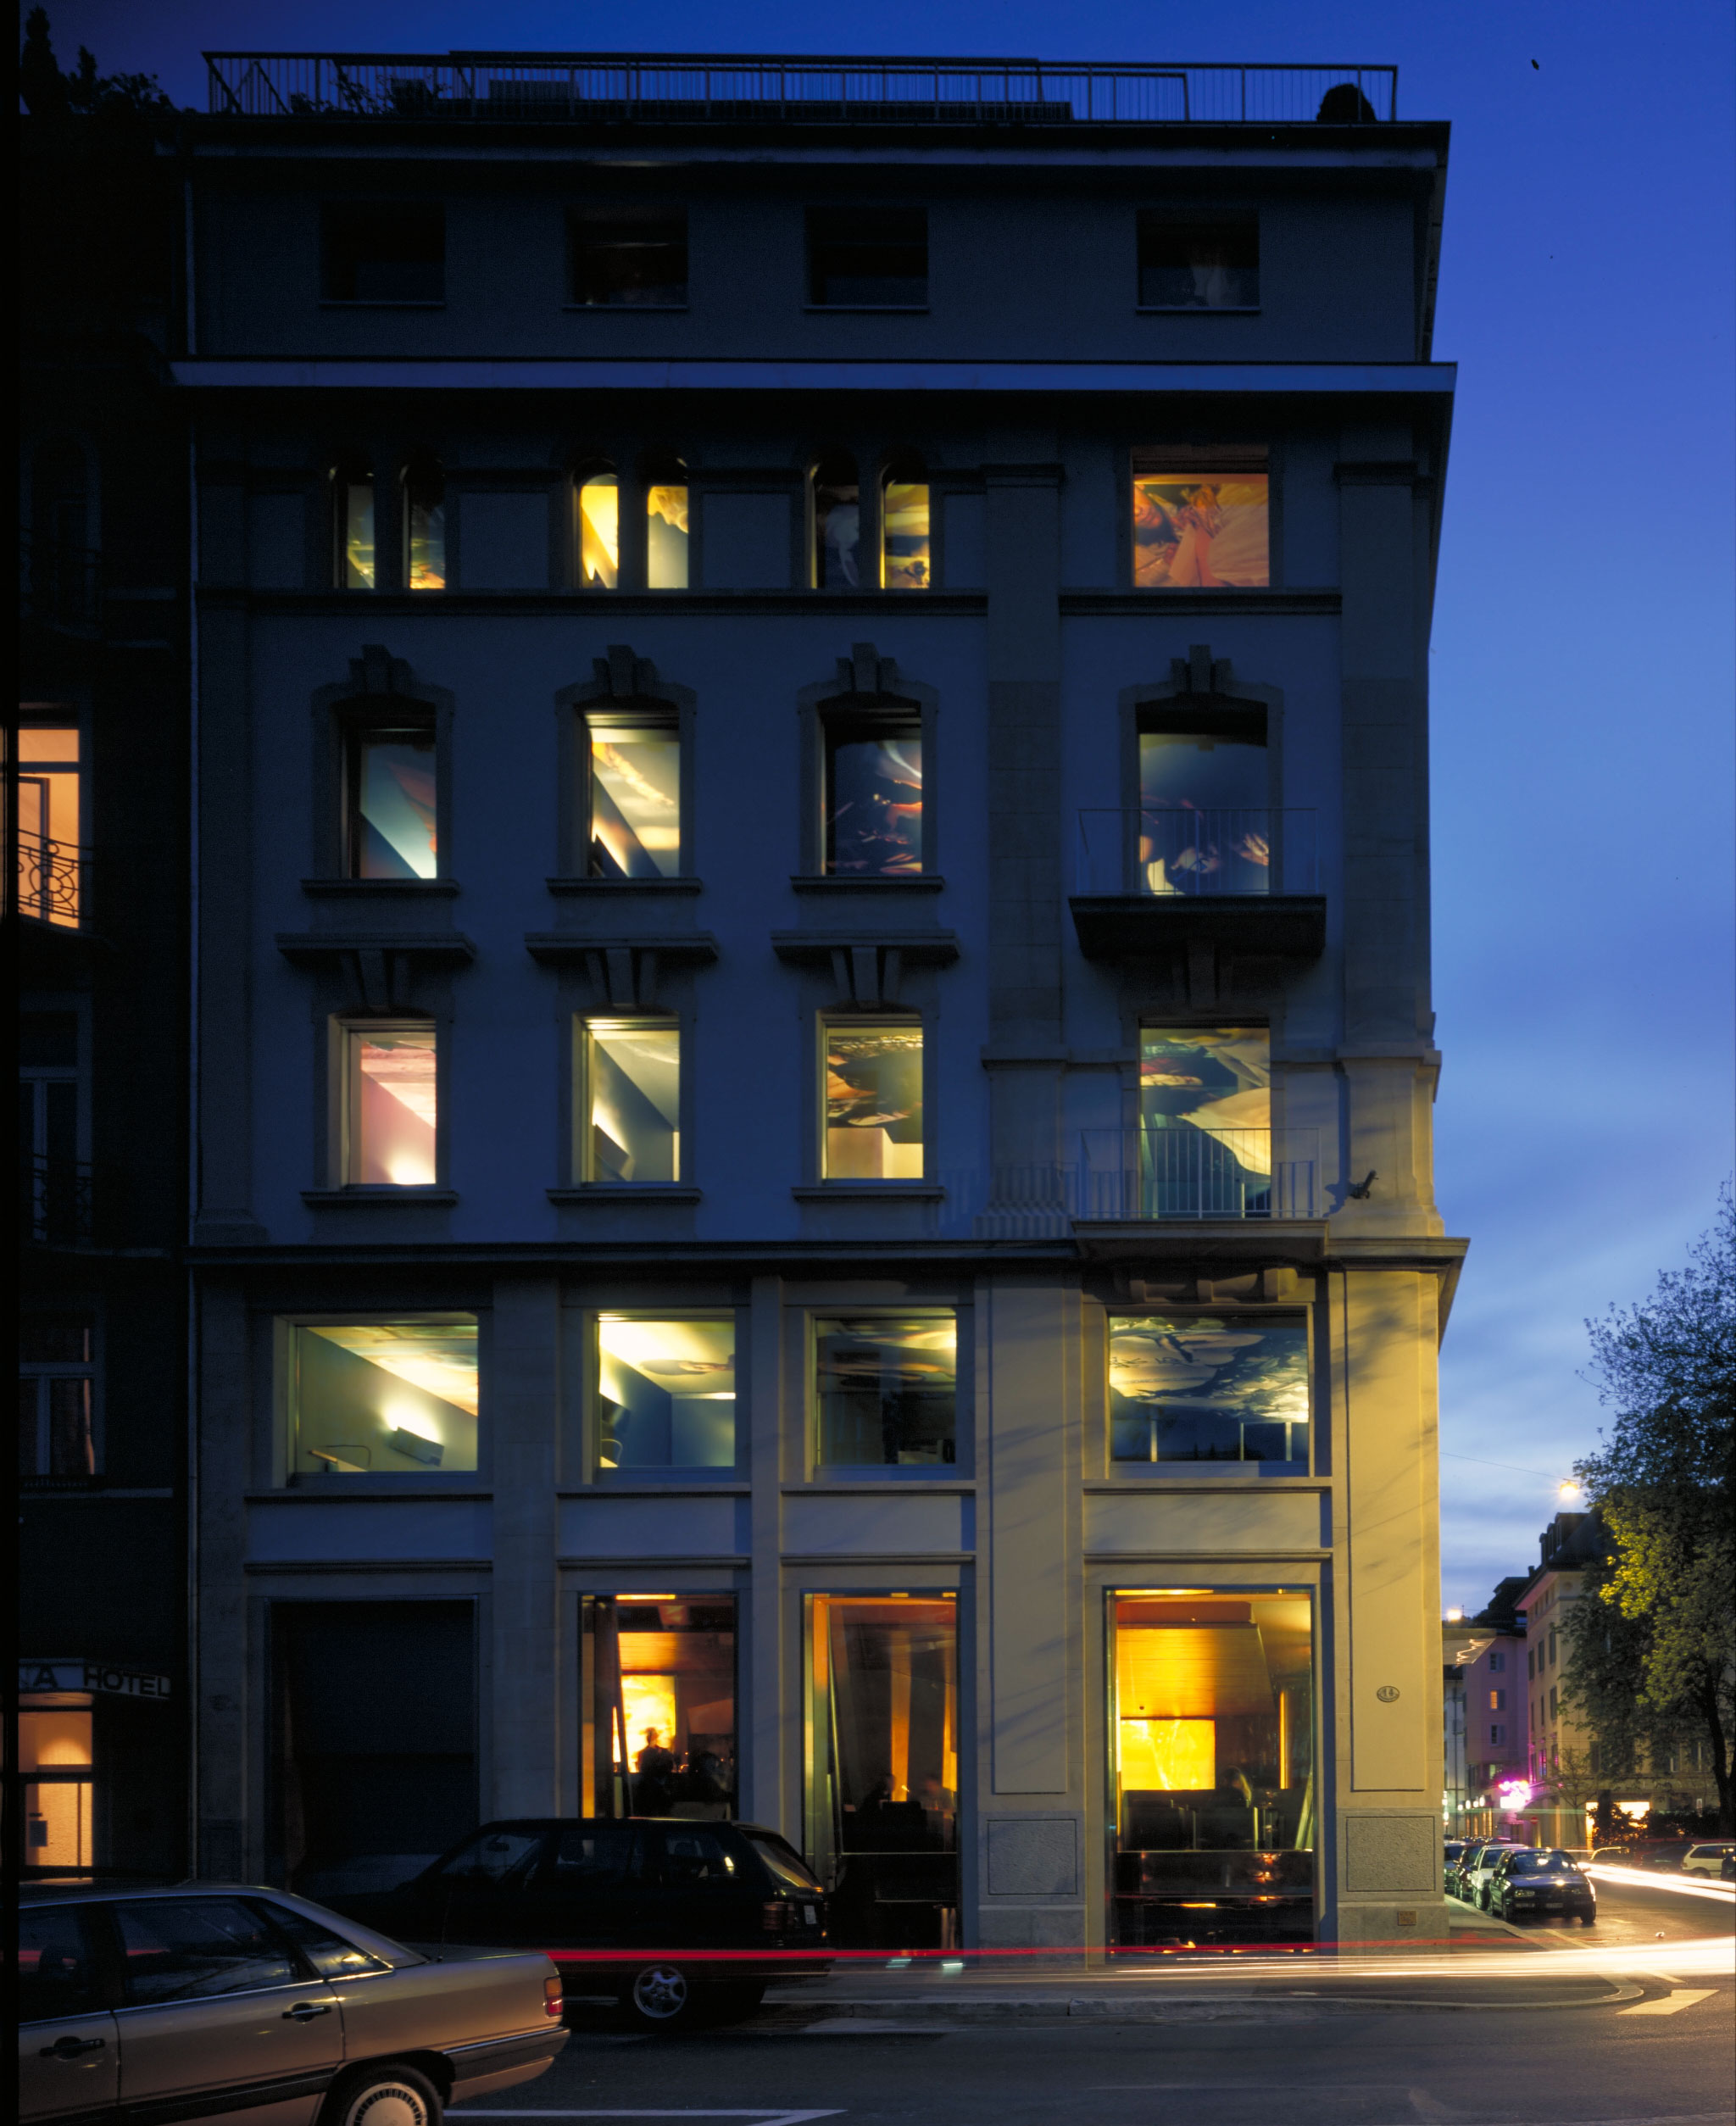 The Hotel Jean Nouvel Design